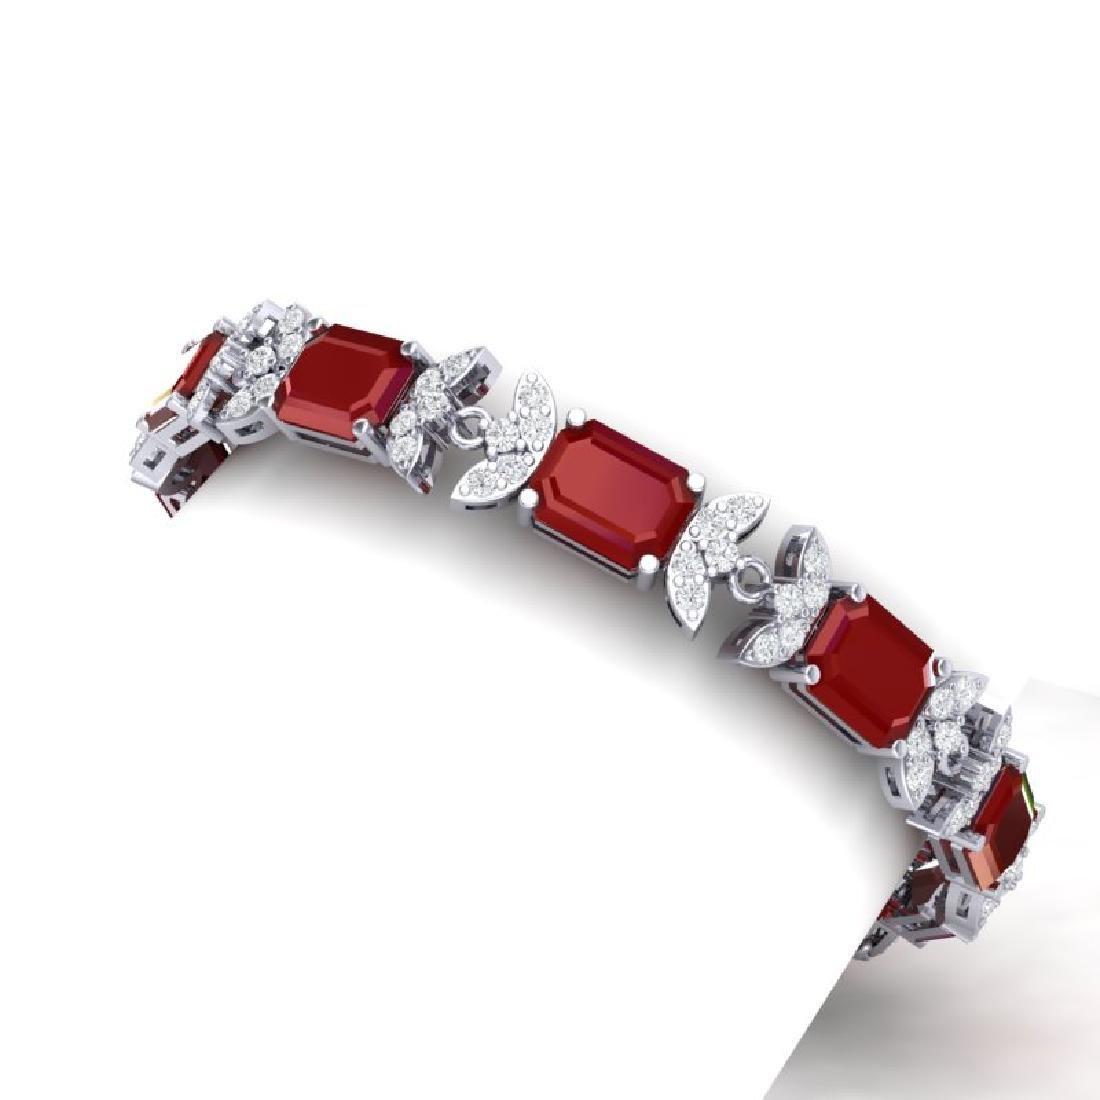 38.13 CTW Royalty Ruby & VS Diamond Bracelet 18K White - 2